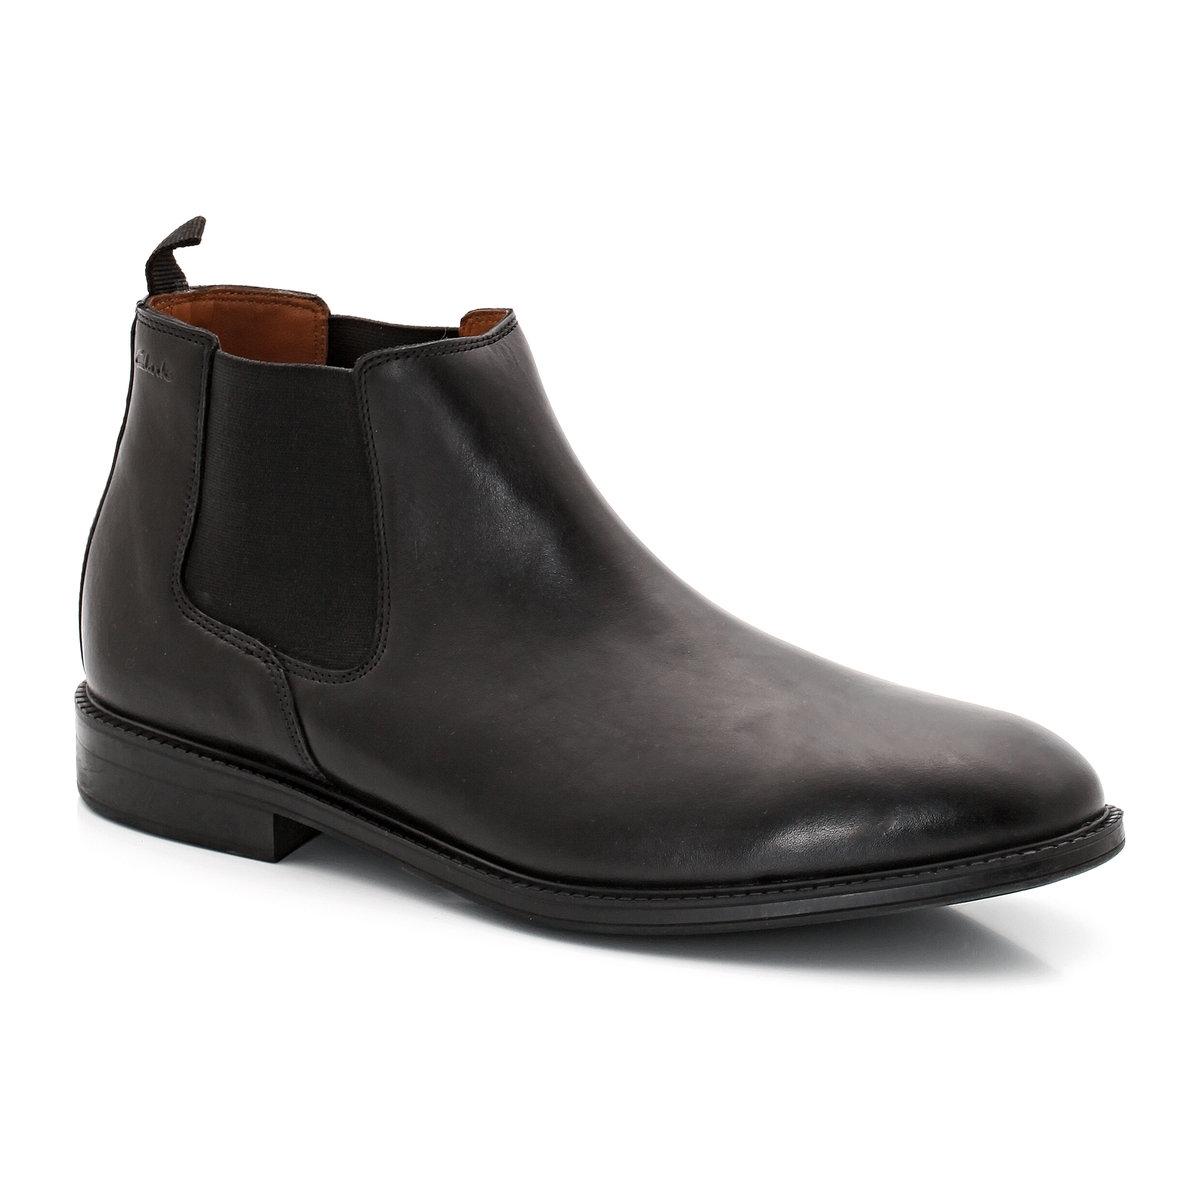 Ботинки кожаные Chilver Top